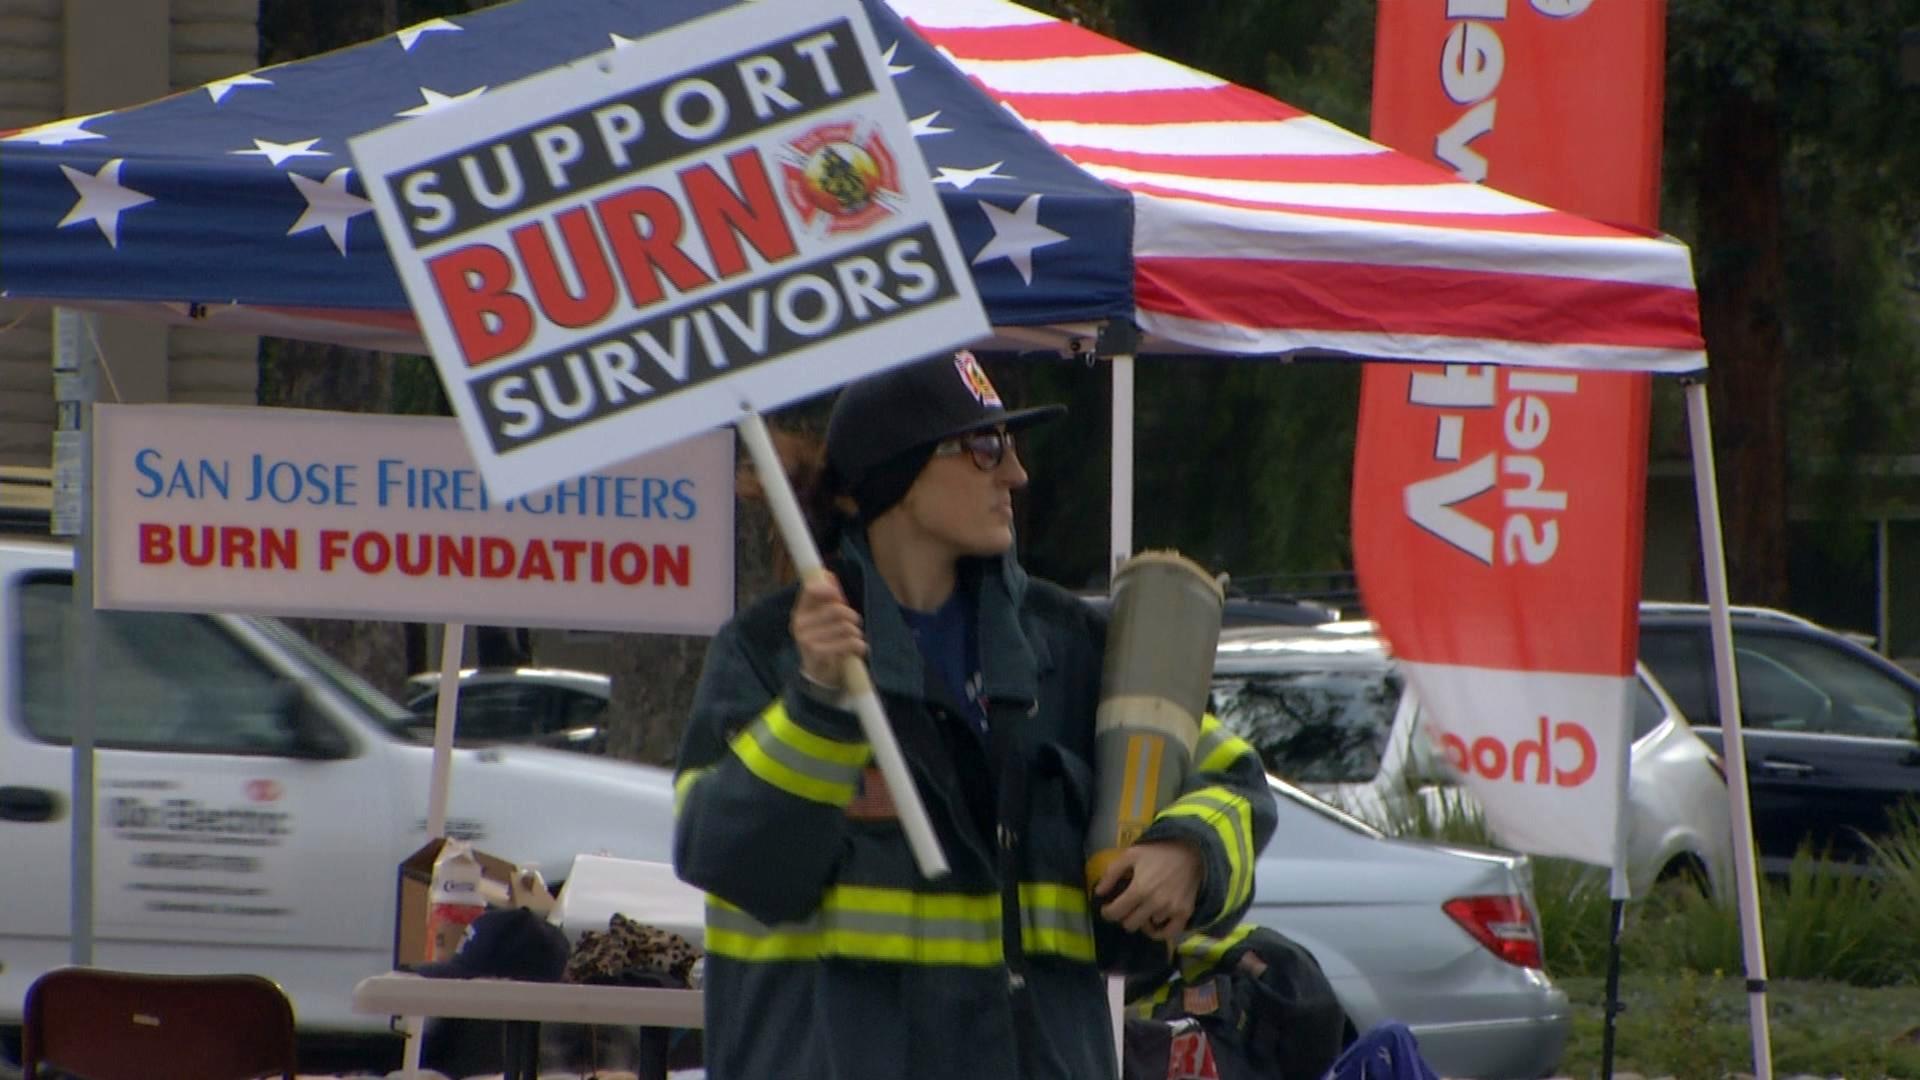 559ae8ca6511 San Jose firefighters help raise money for burn victims. (Nov. 26